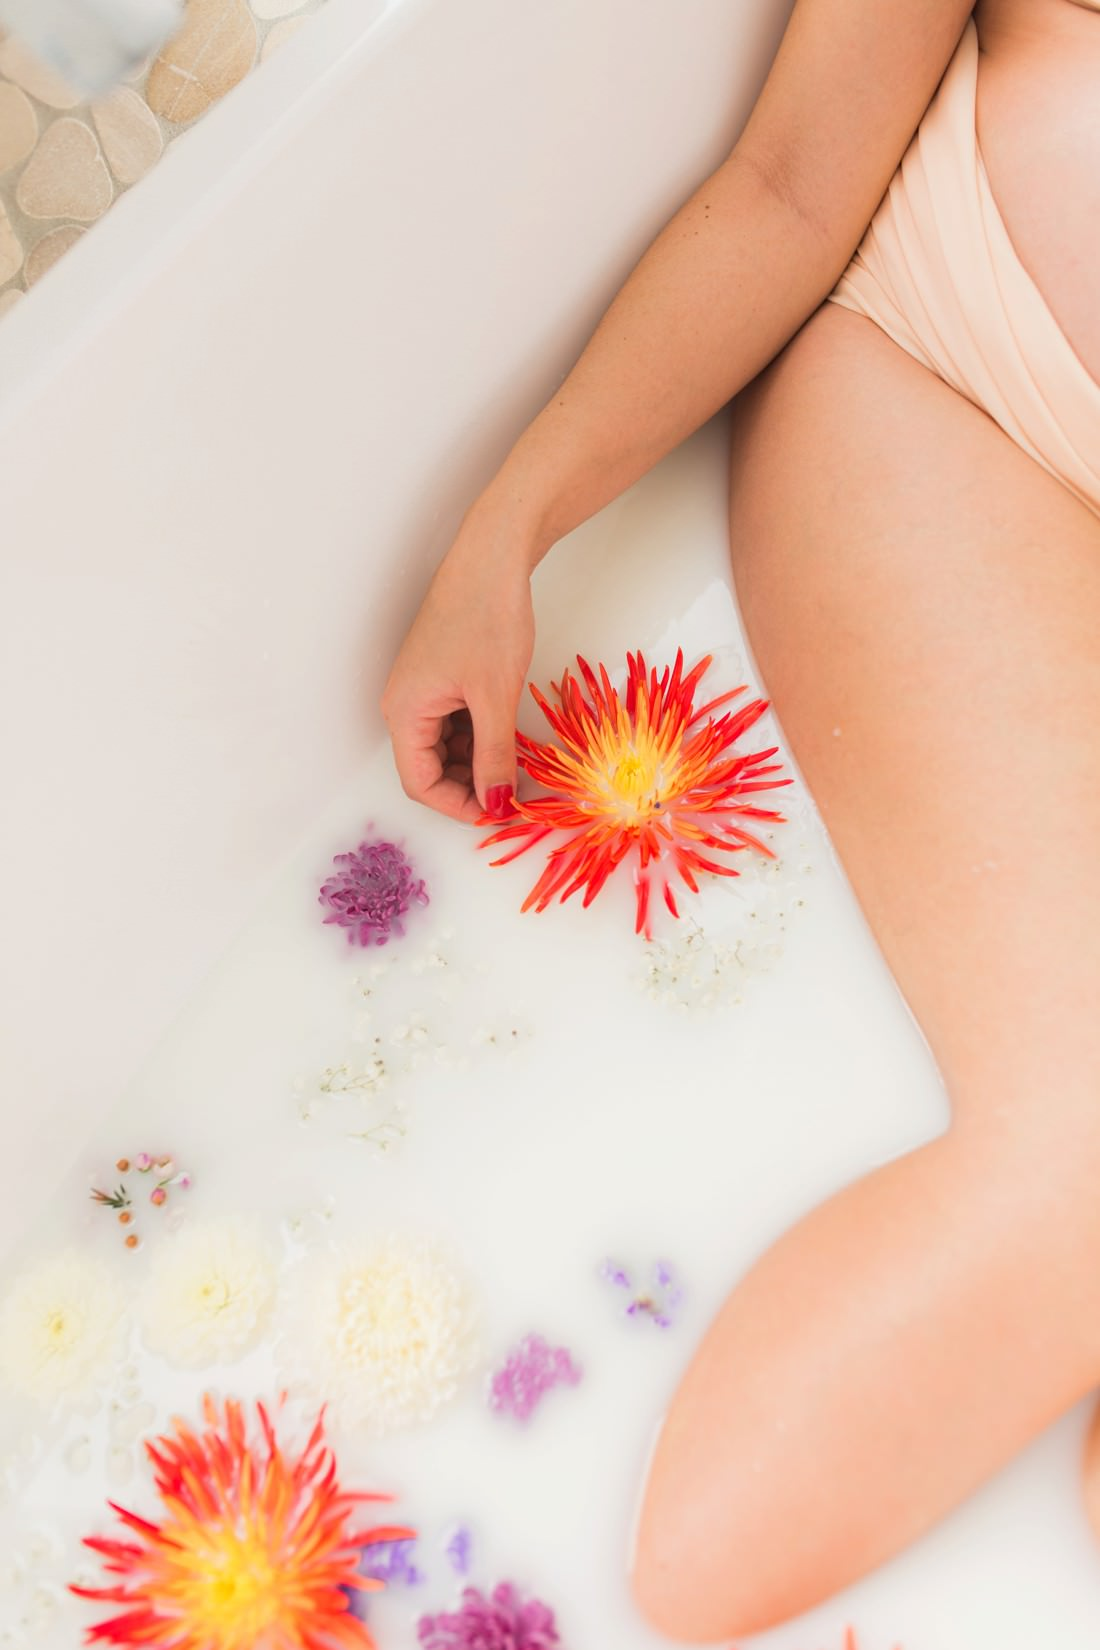 Milk bath pregnancy photoshoot by Mario Colli Photography